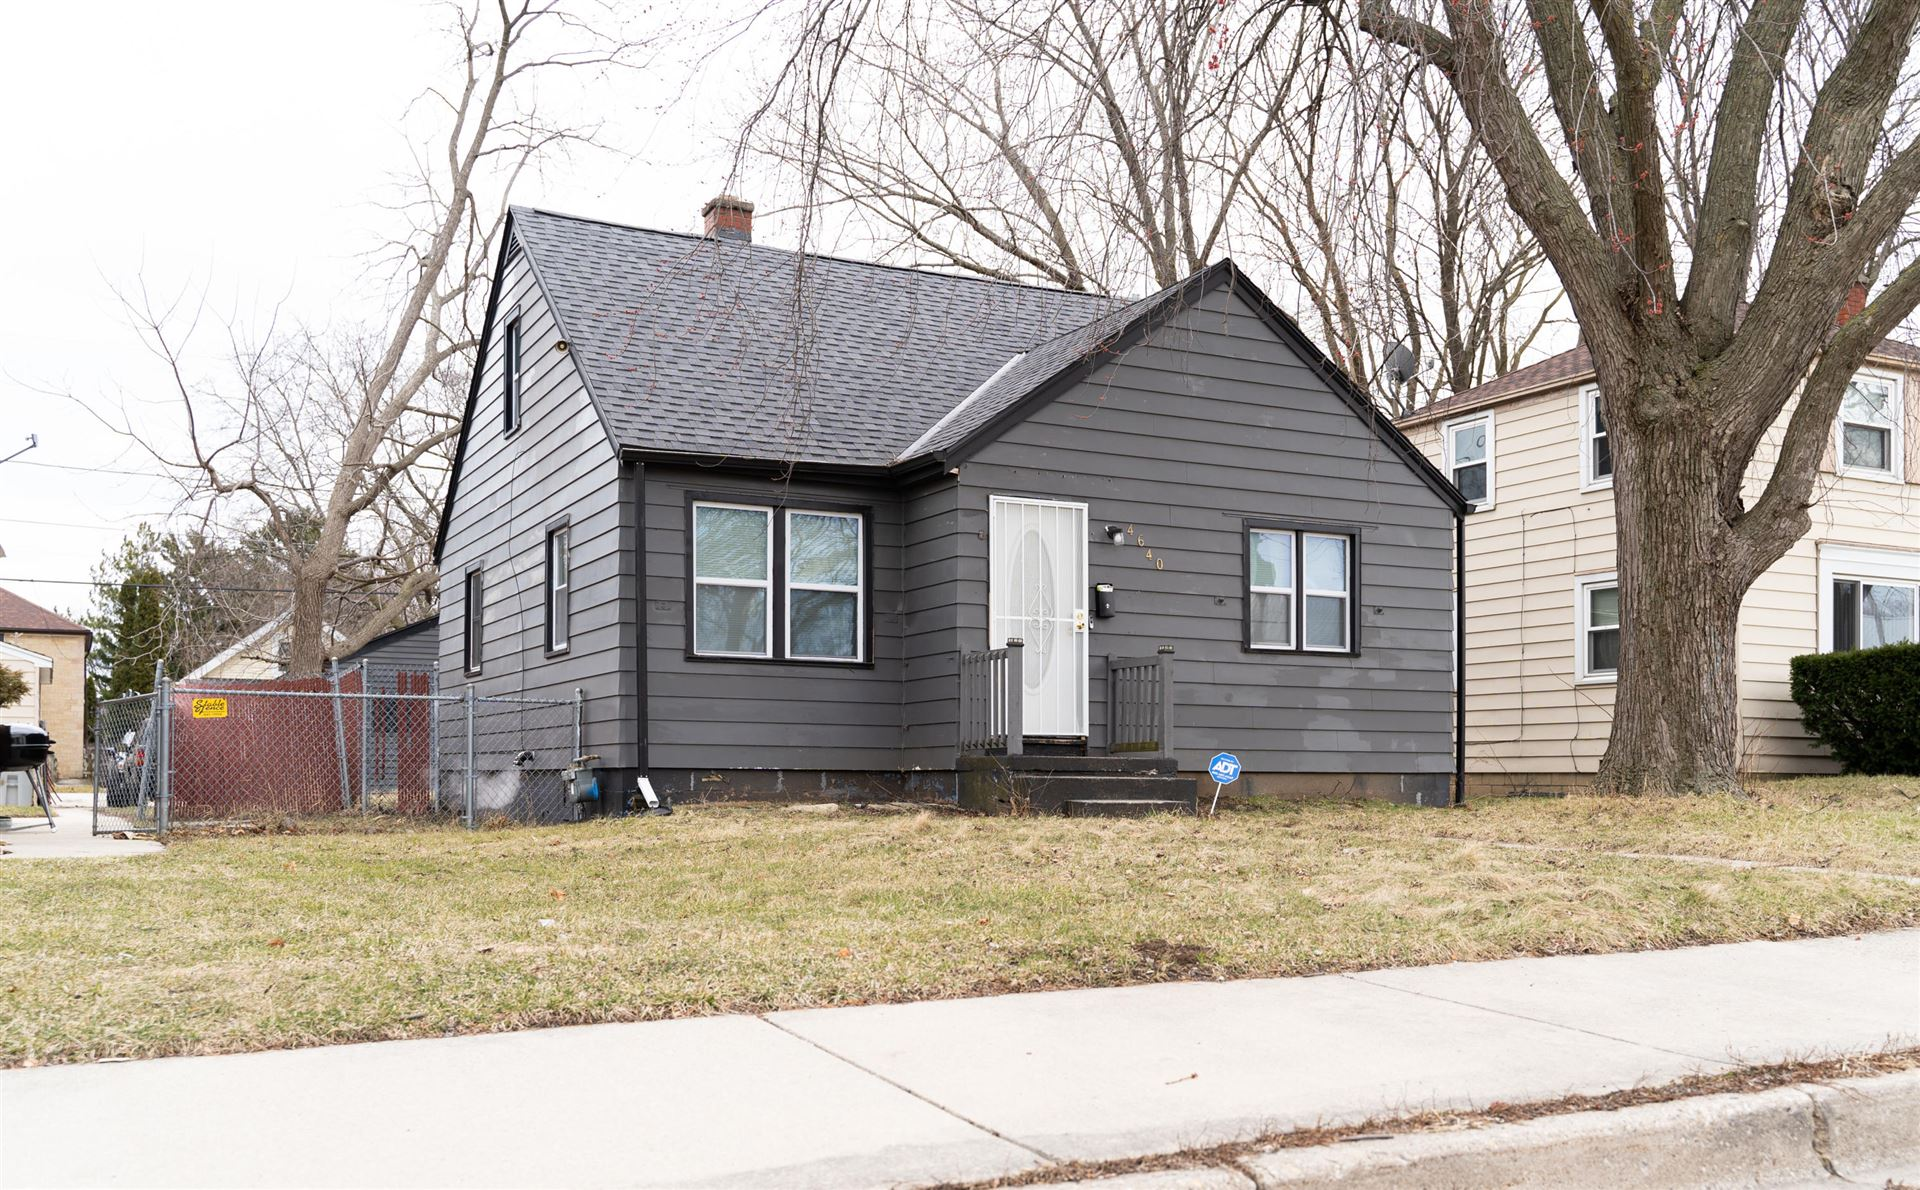 4640 N 20th St, Milwaukee, WI 53209 - #: 1682261